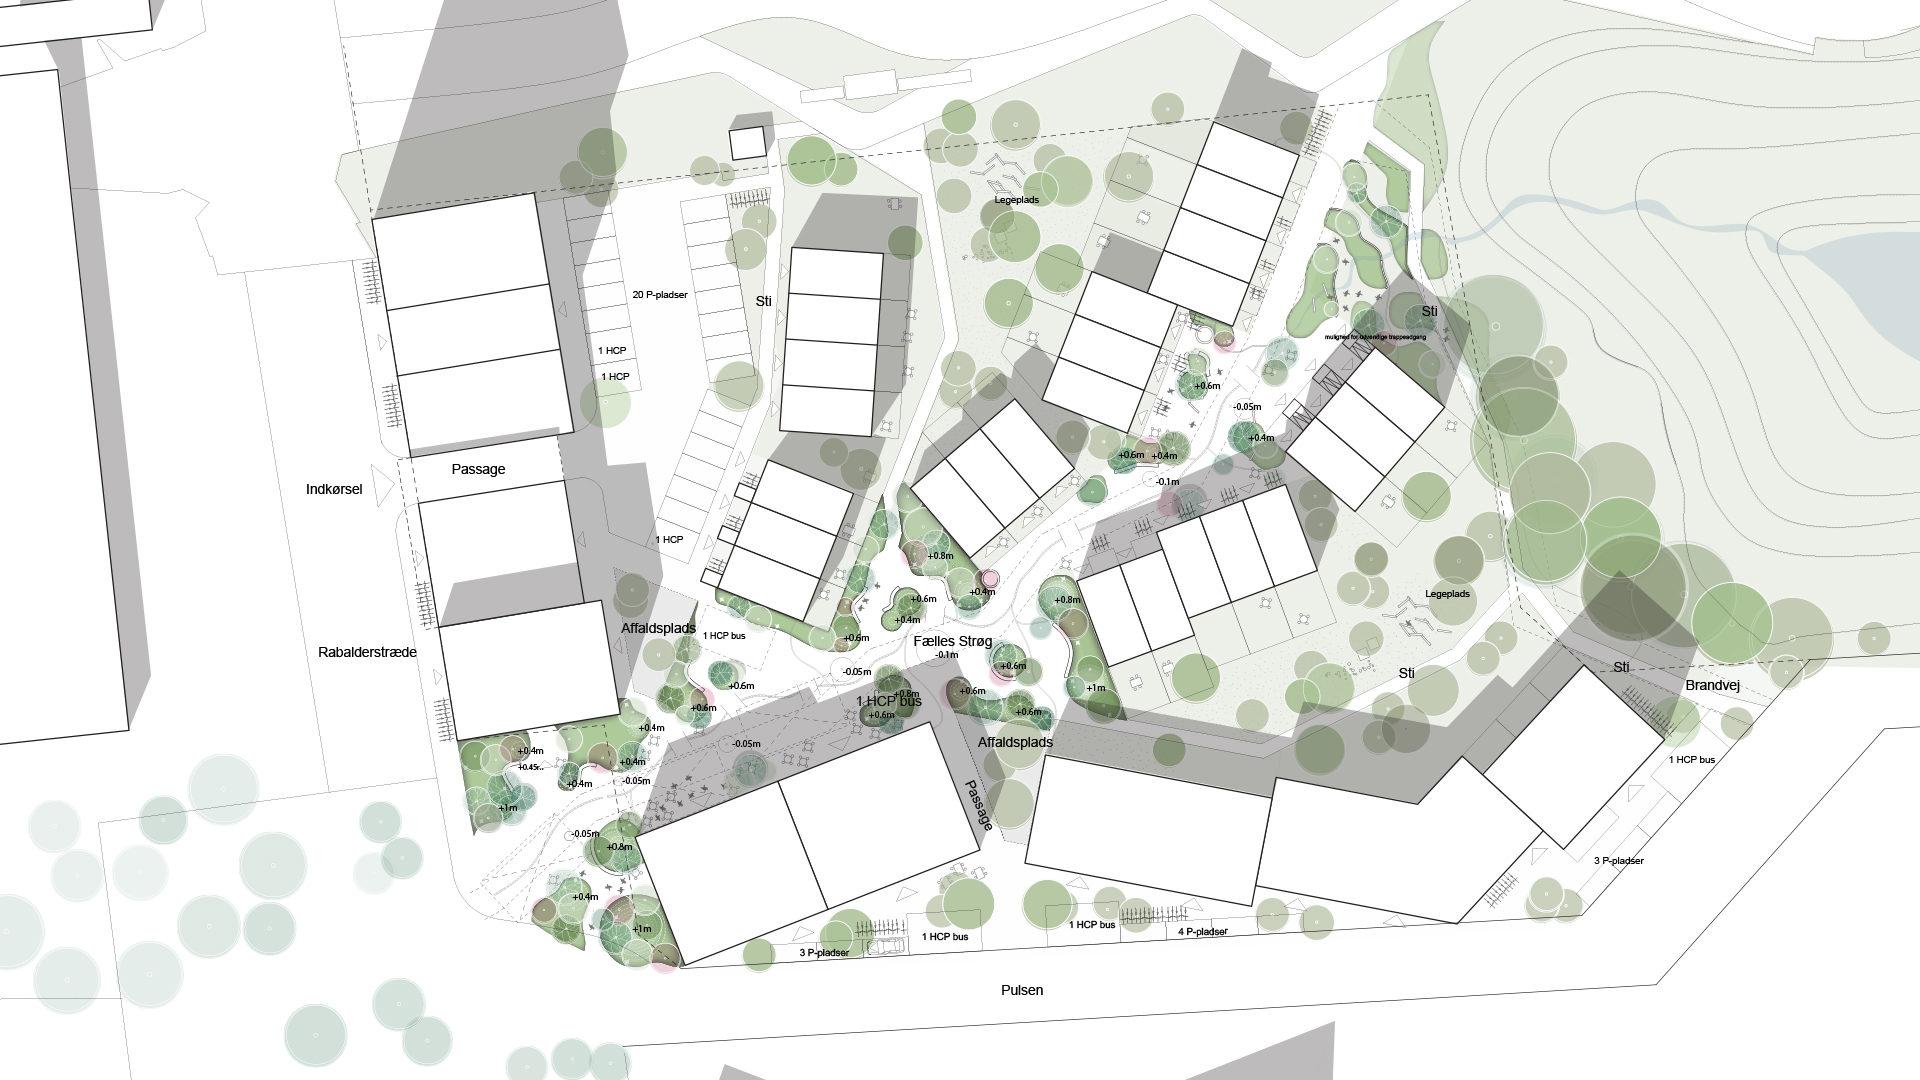 mixed-use urban area